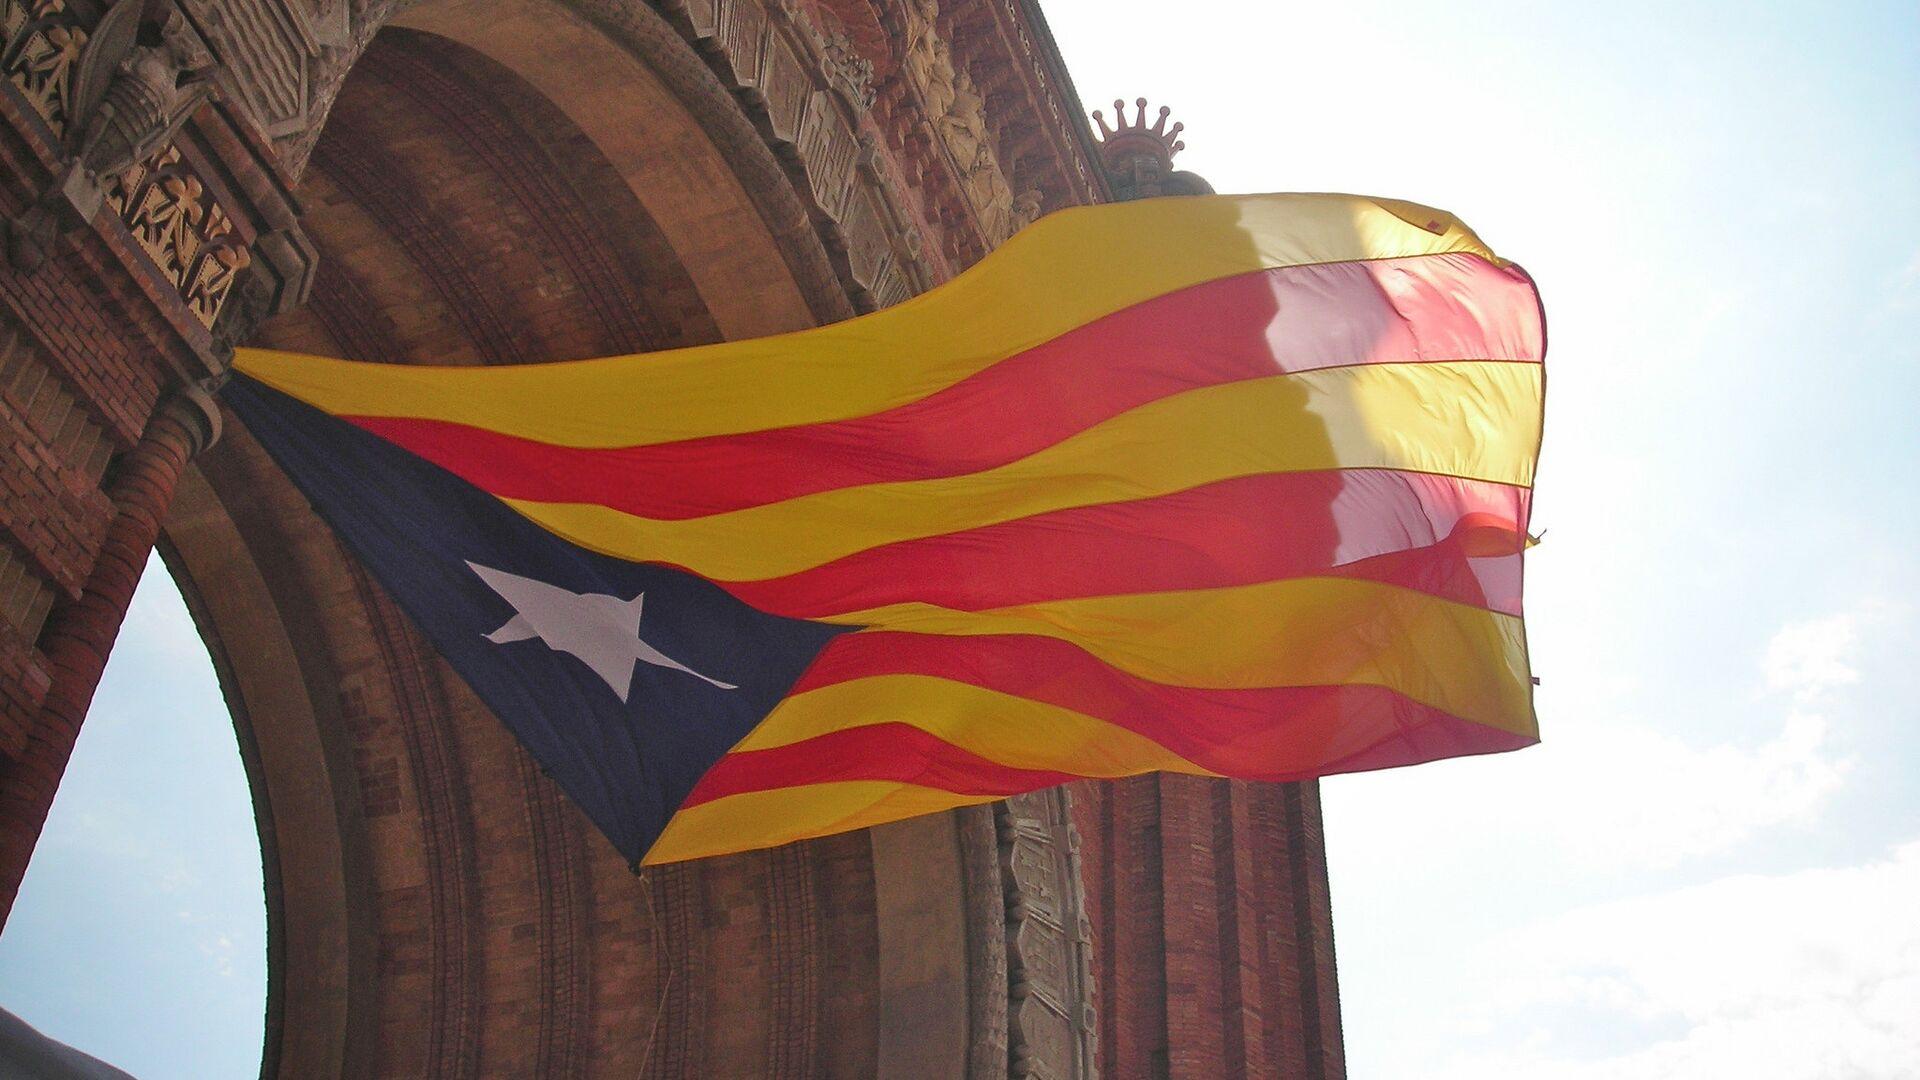 Estelada, la bandera independentista de Cataluña - Sputnik Mundo, 1920, 14.02.2021